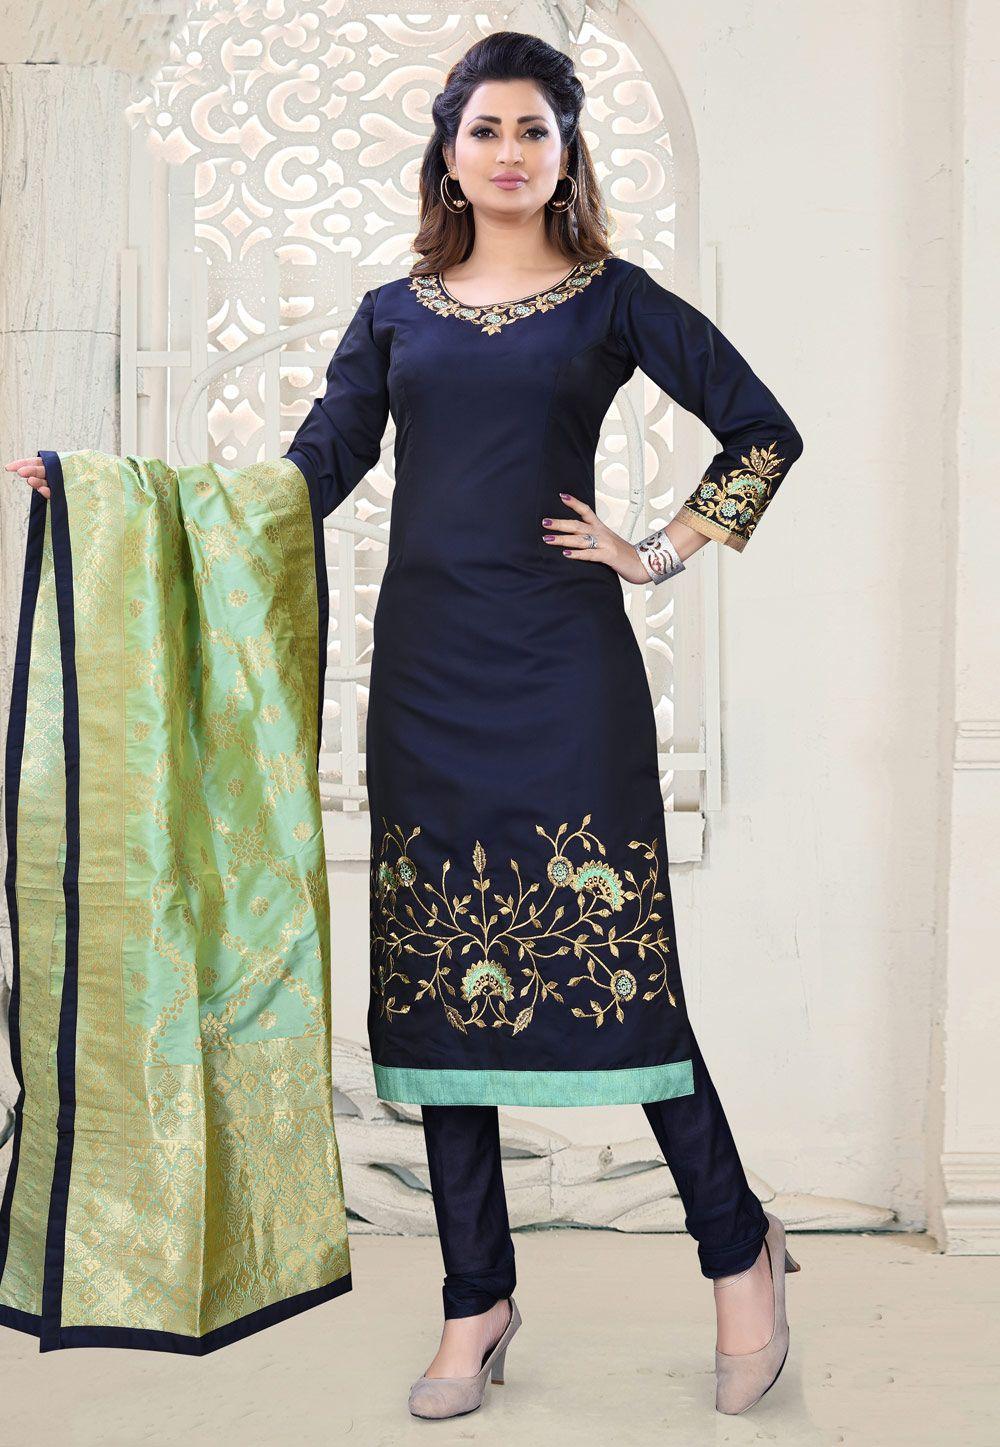 daca2a1943 Buy Navy Blue Cotton Silk Readymade Churidar Salwar Kameez 156553 online at  lowest price from huge collection of salwar kameez at Indianclothstore.com.